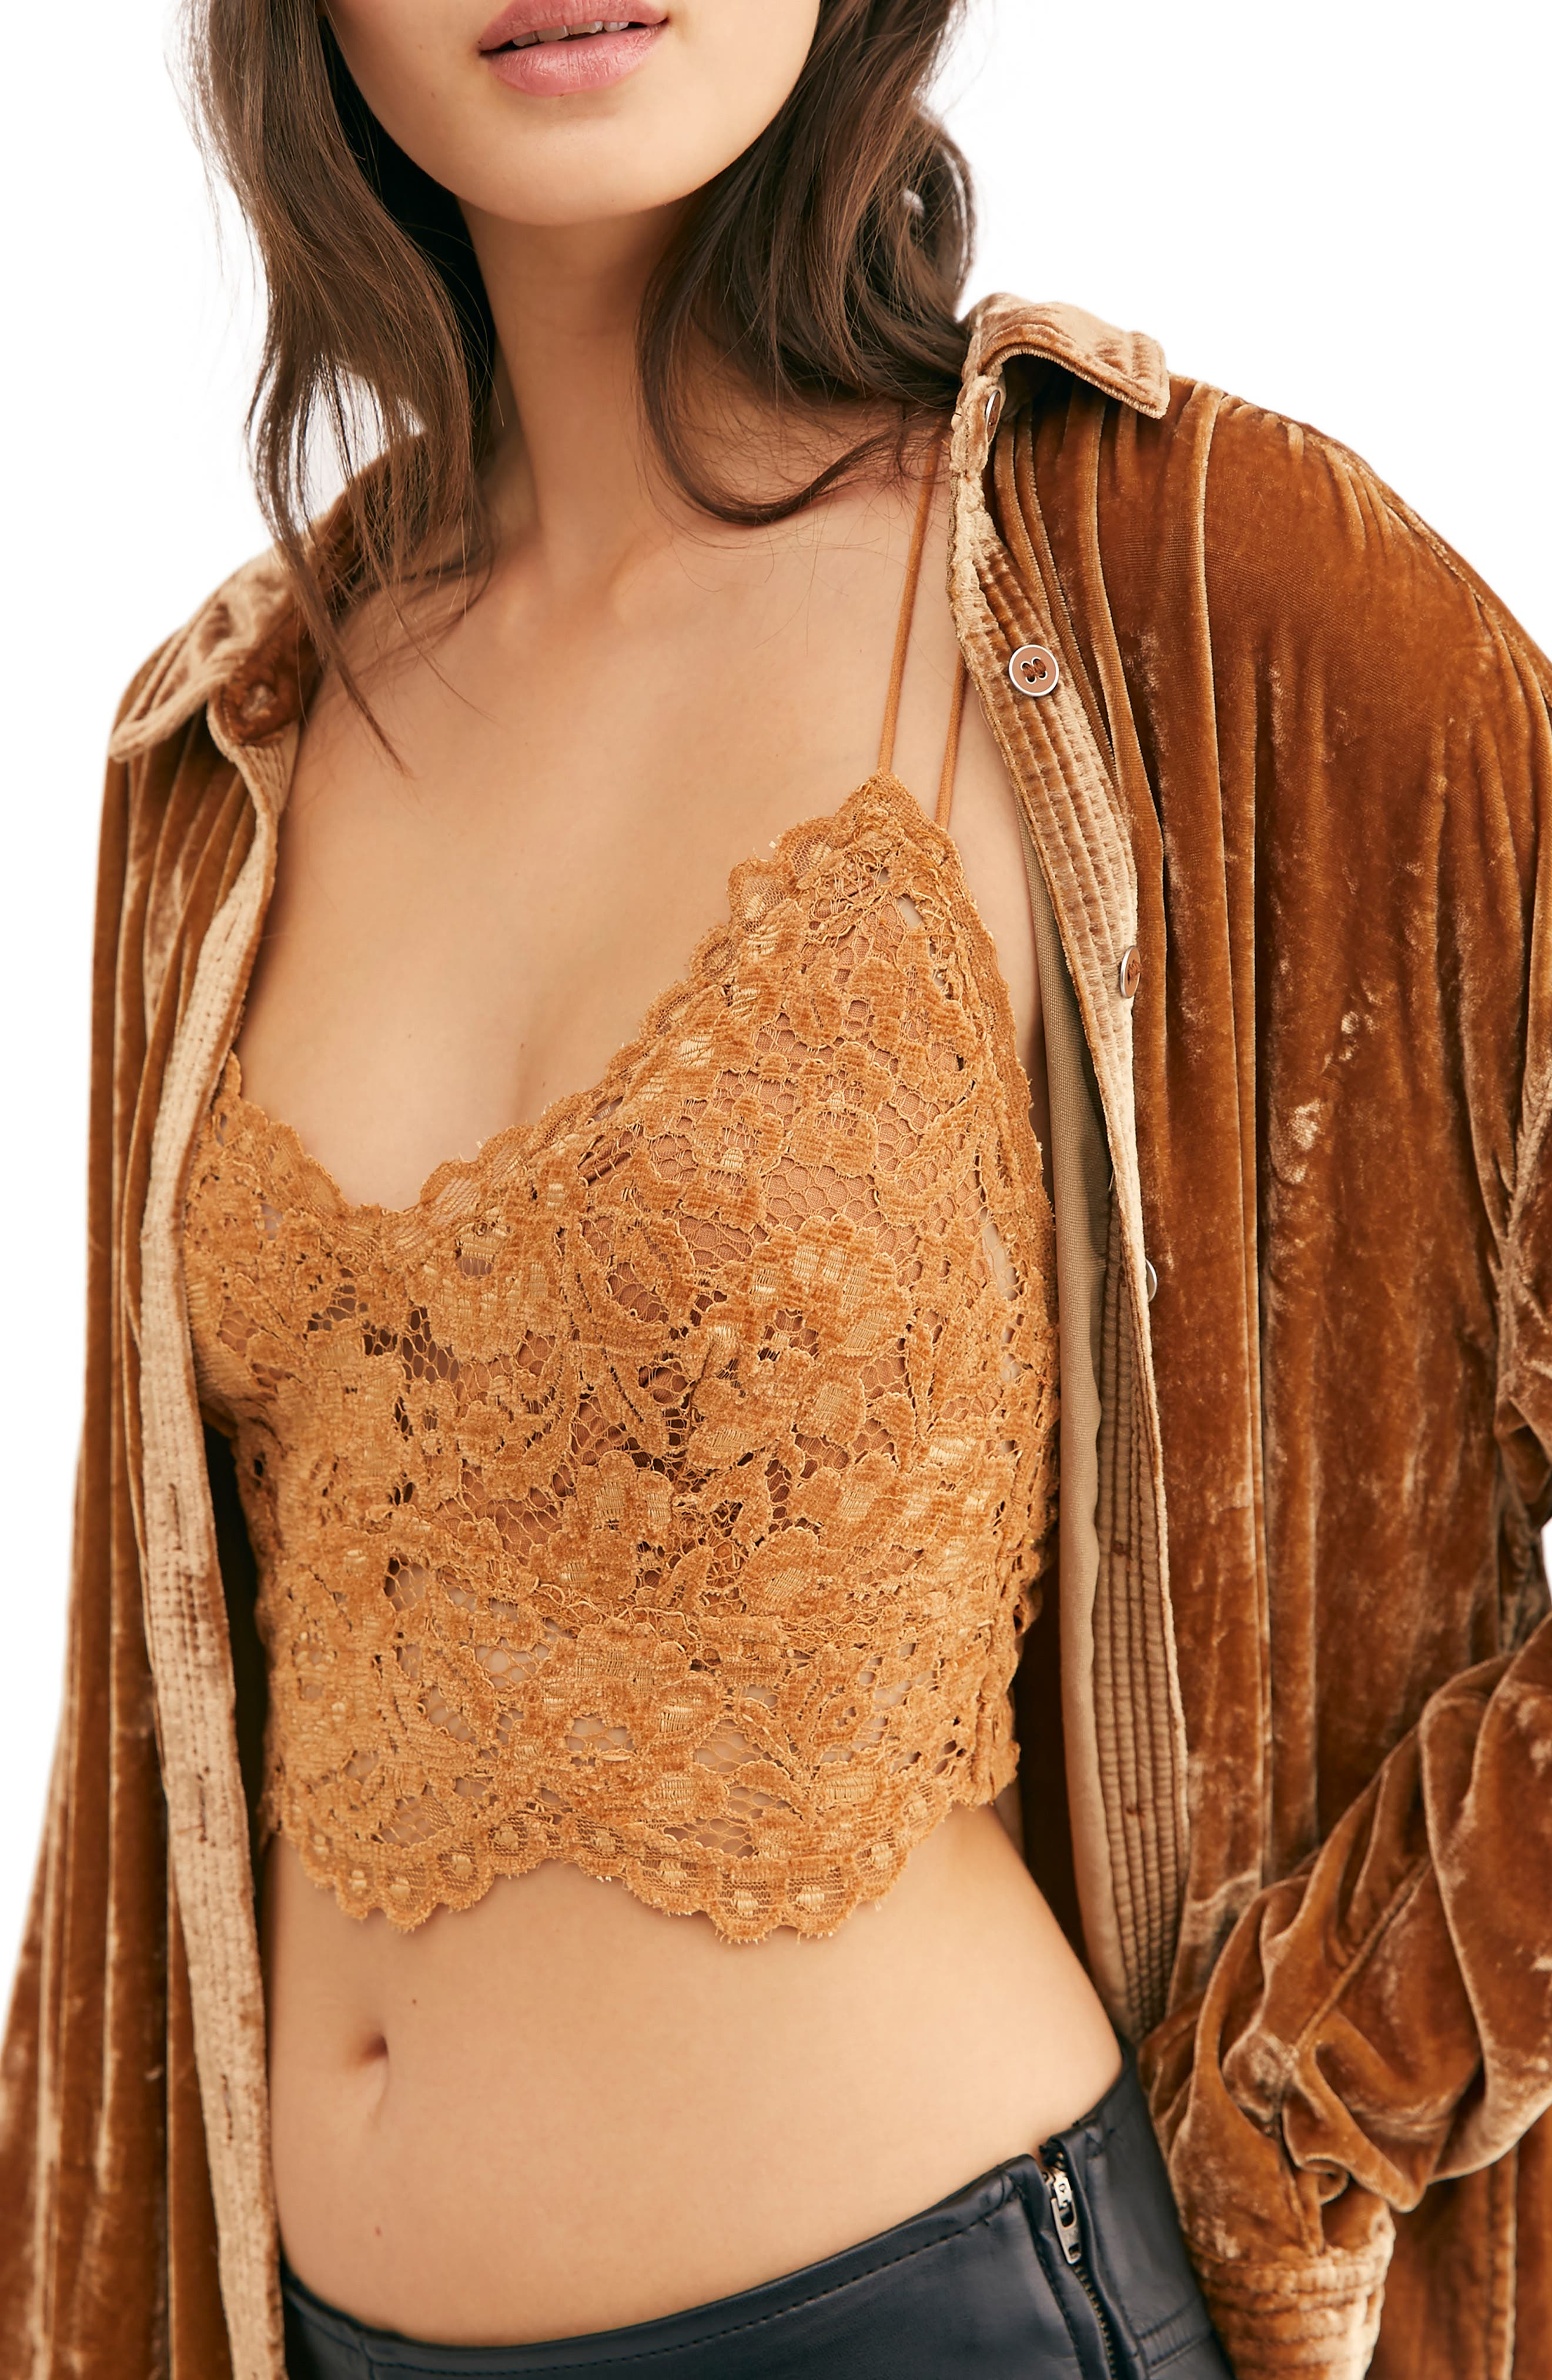 Free People Intimately FP Celine Longline Lace Bralette